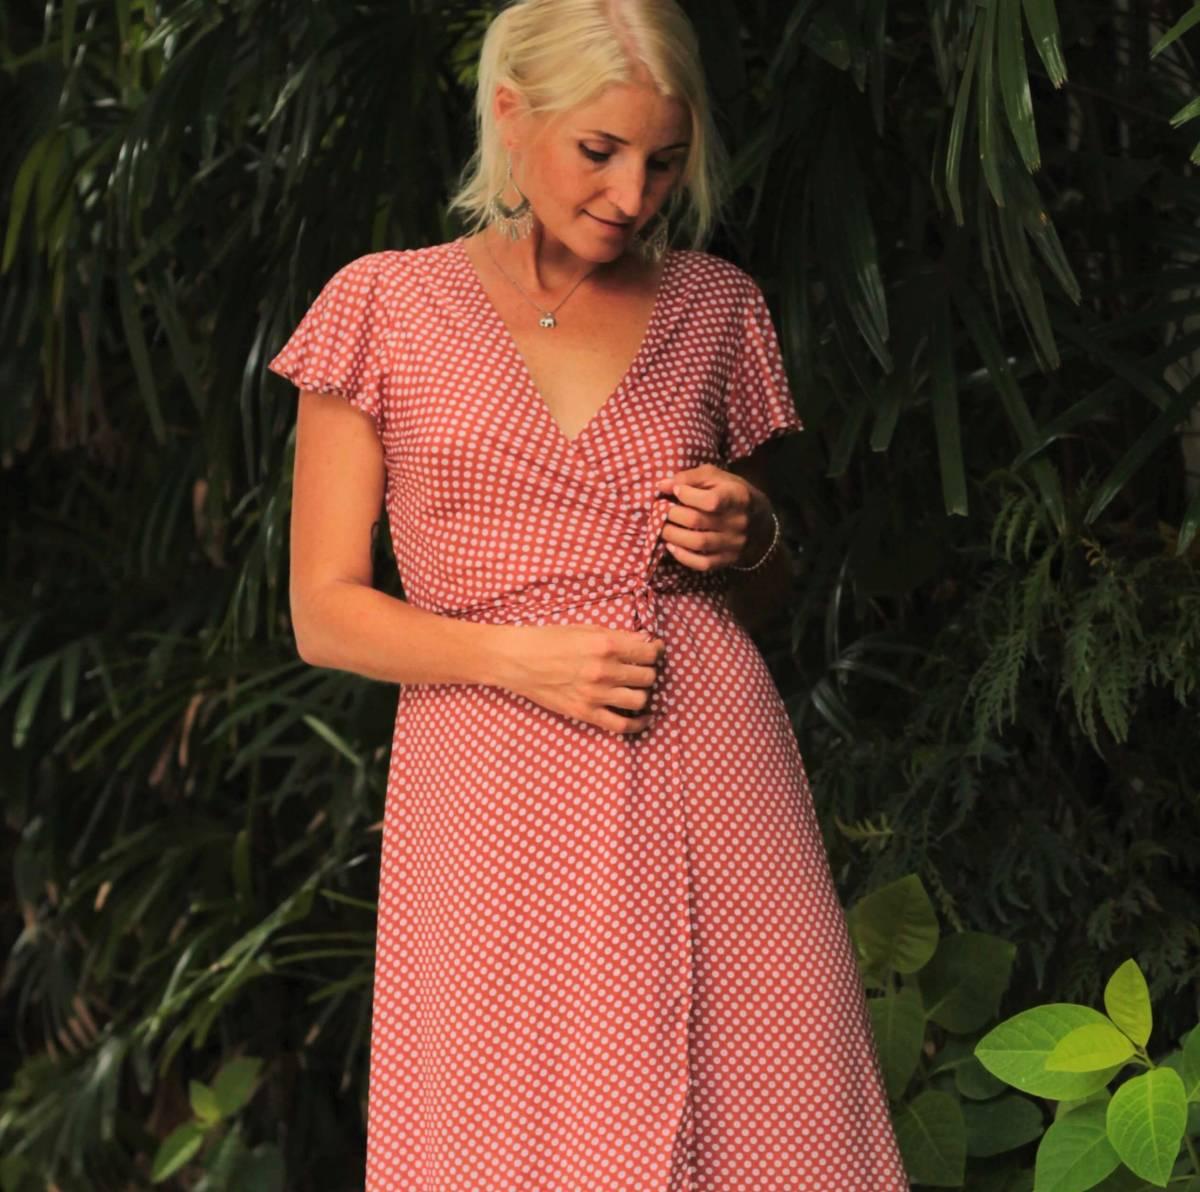 Polka Dot Kleid lang hellbraun weiss für den Sommer